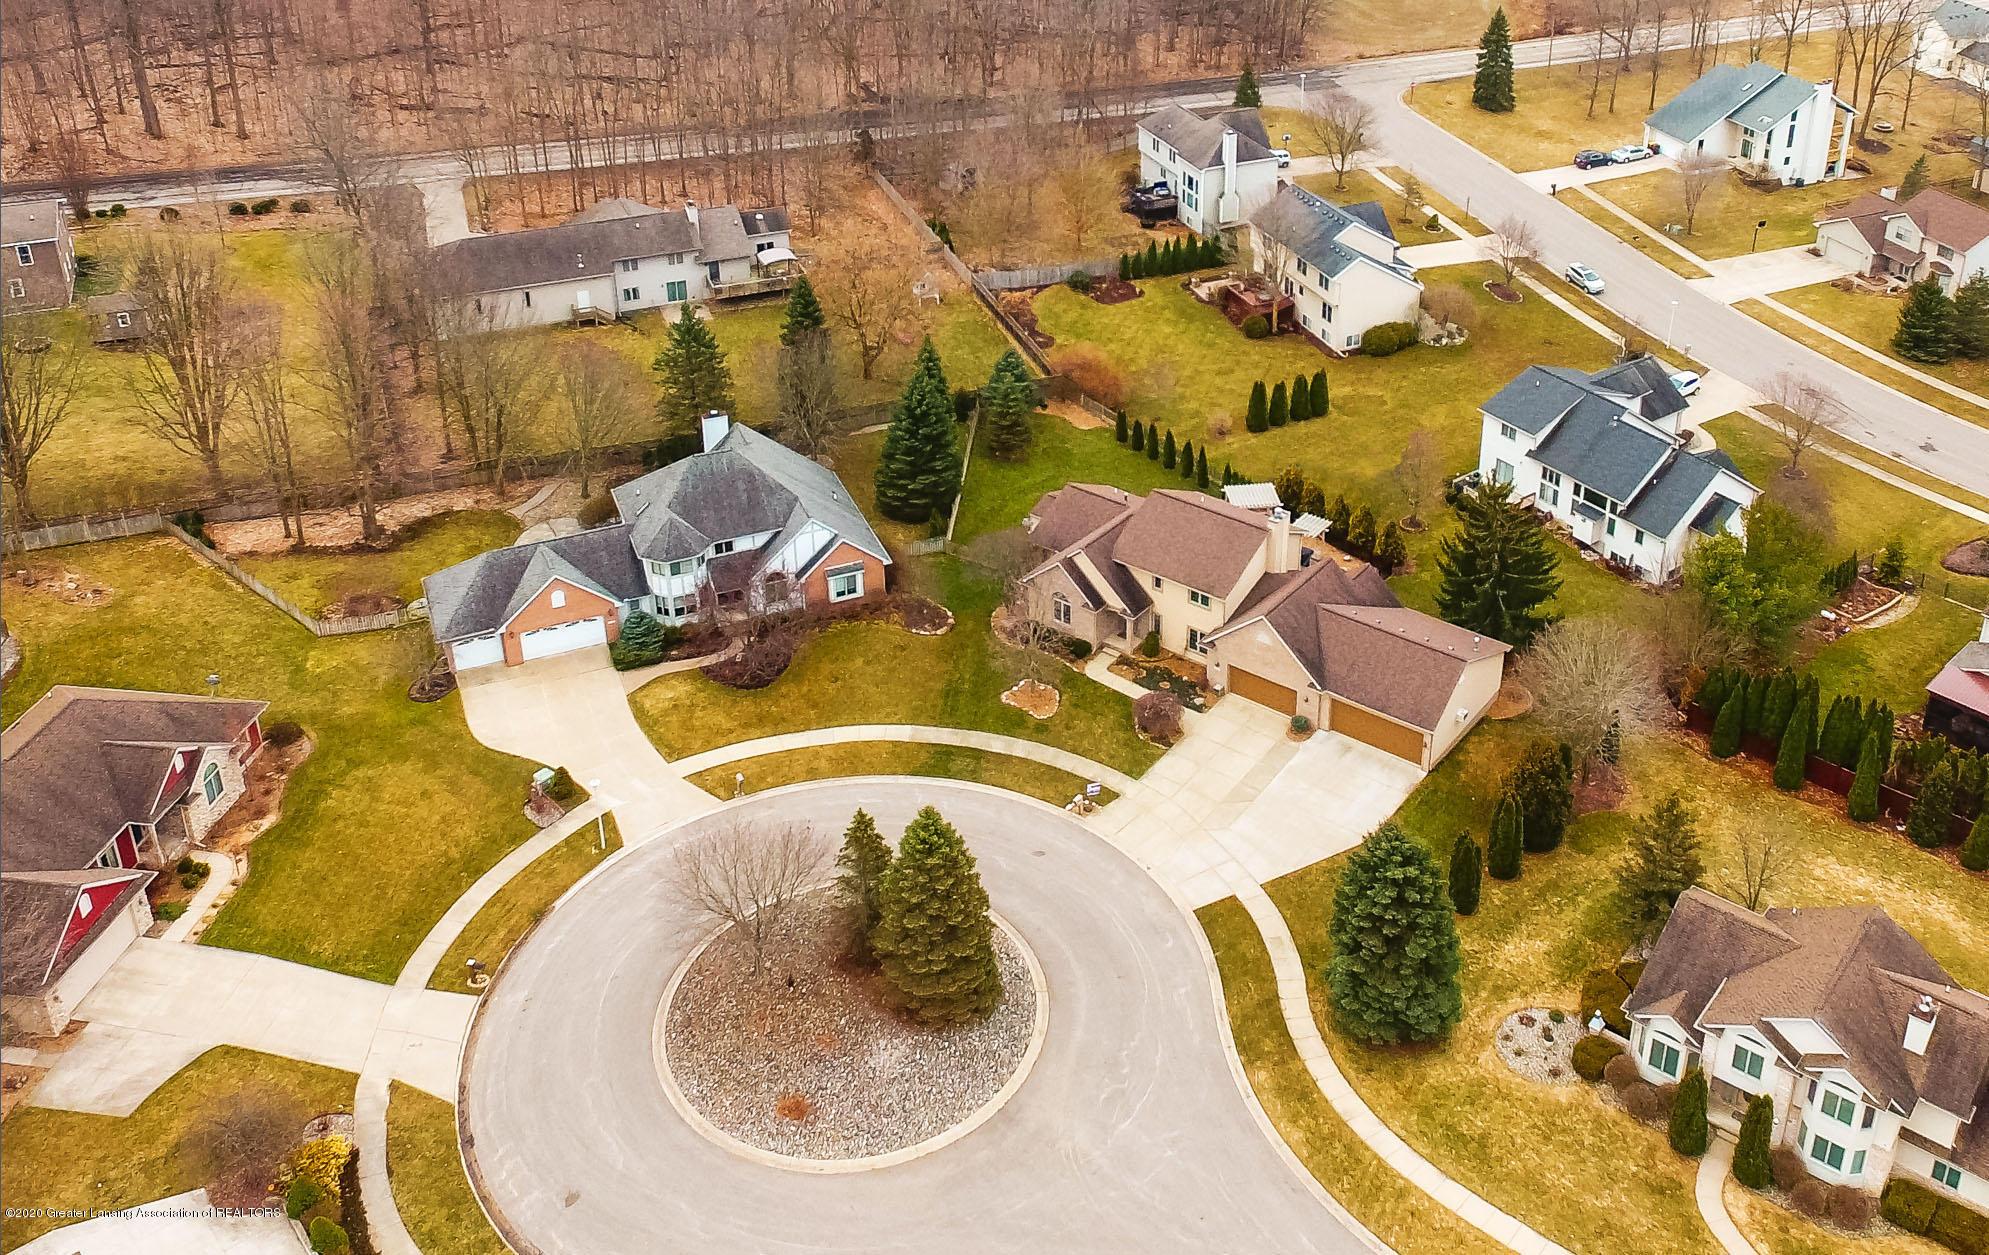 2785 Dunwoody Cir - Aerial View - 1